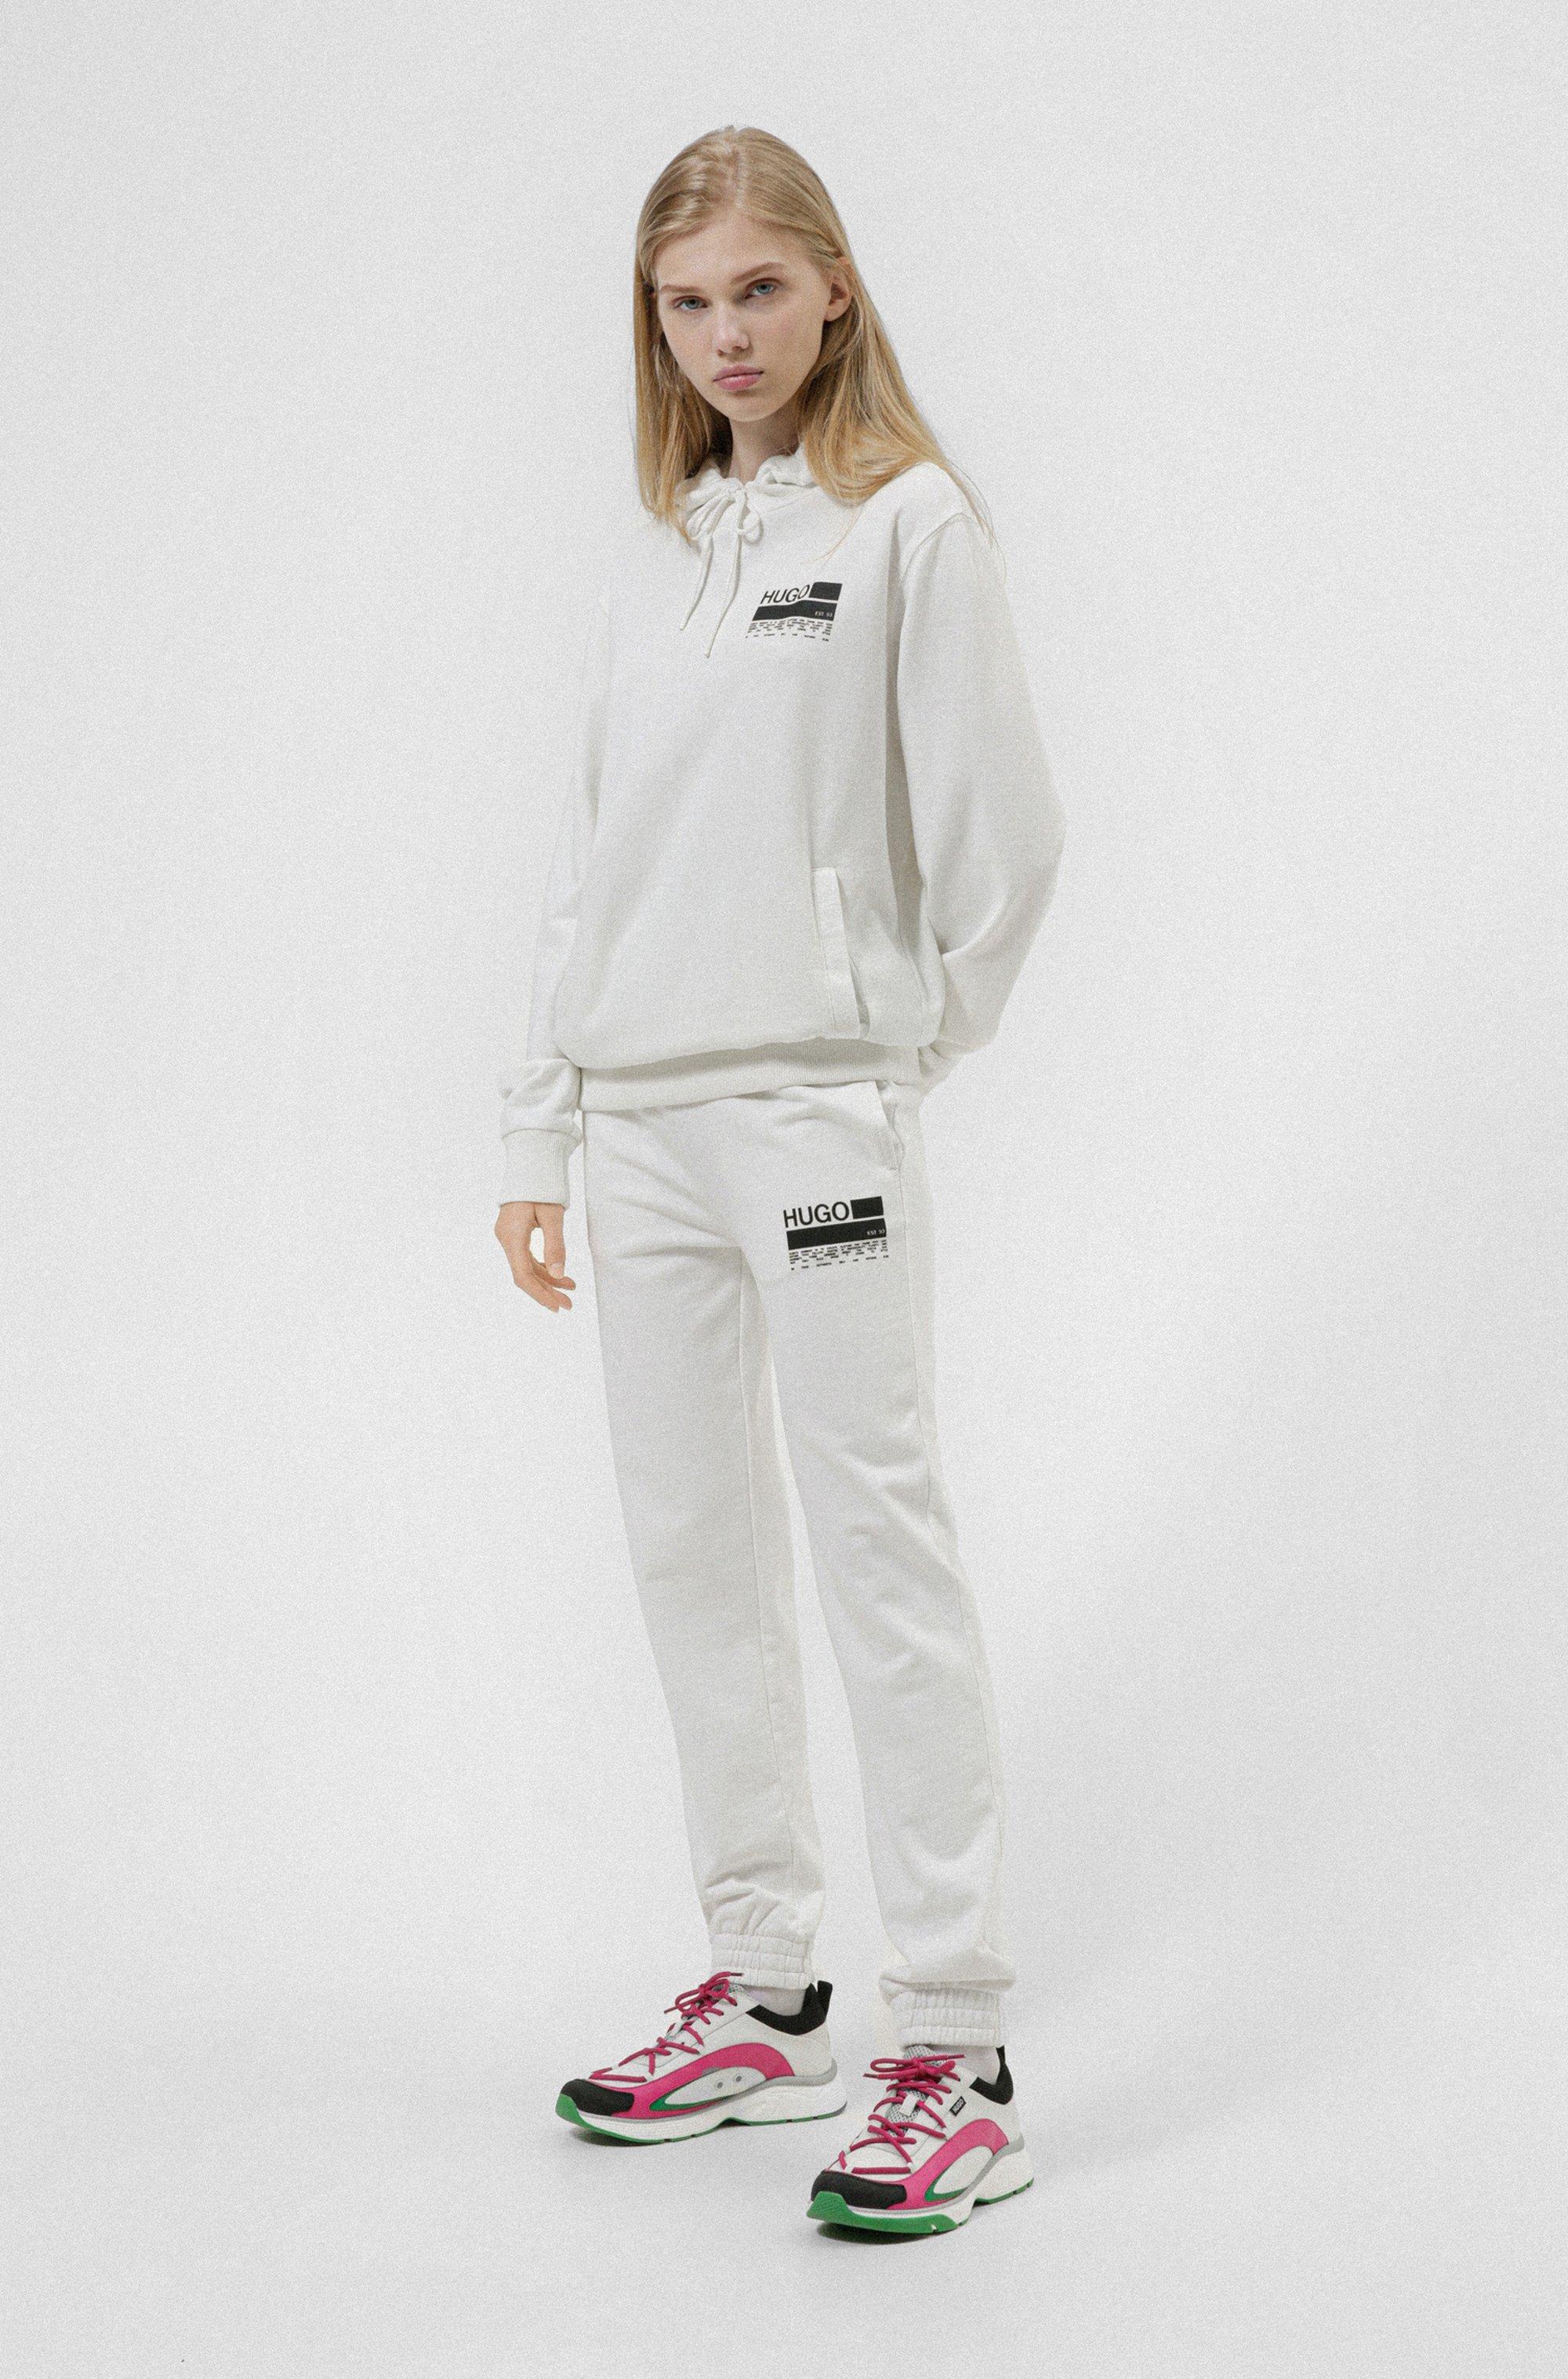 Manifesto-print hooded sweatshirt in Recot²® cotton